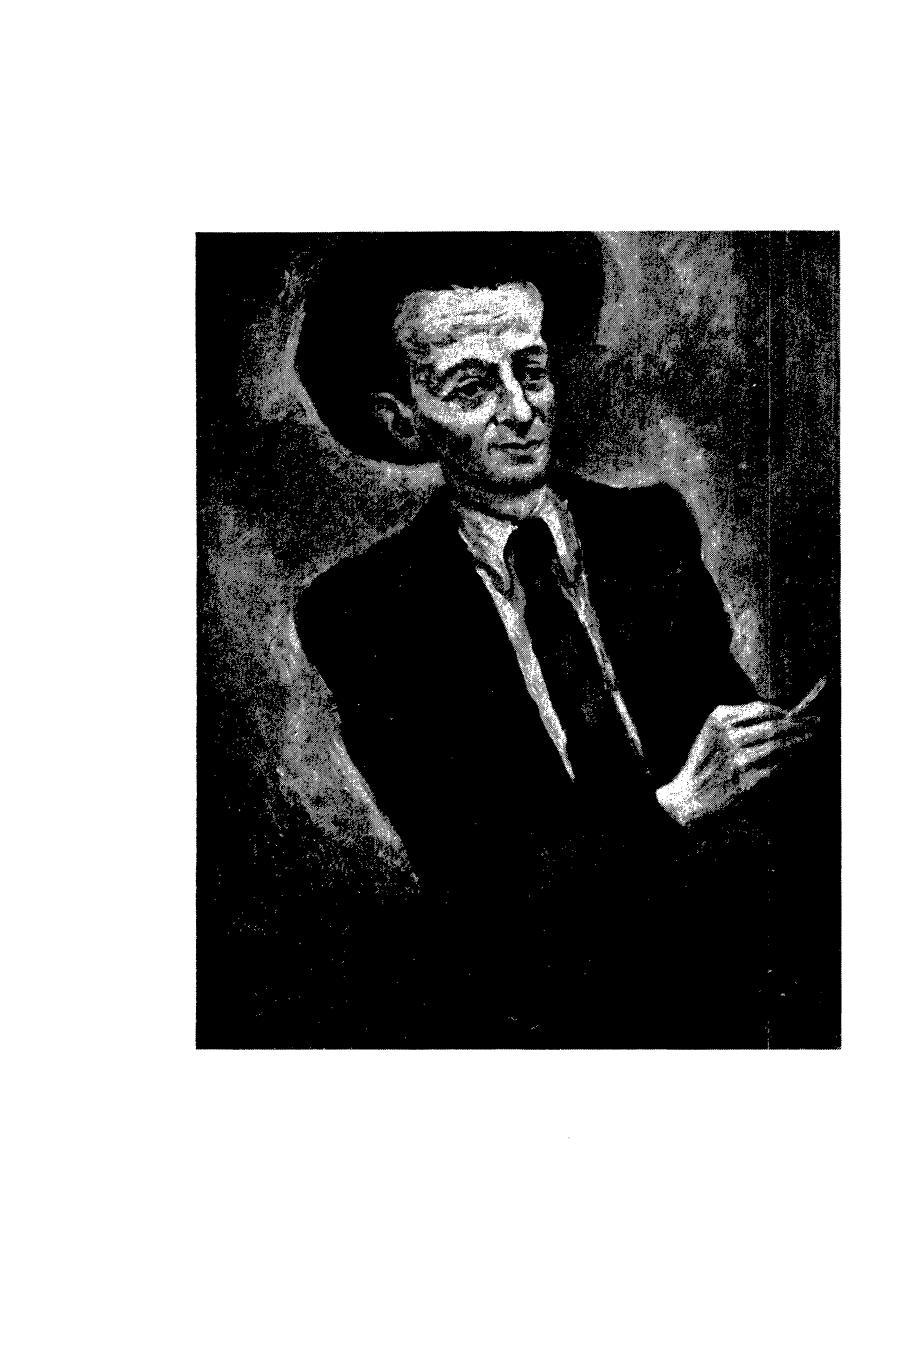 <p>Itsik Manger, portrait in <em>Noente geshtaltn un andere shriftn</em> (New York: Itsik Manger yoyvl komitet,&nbsp;1961).</p>